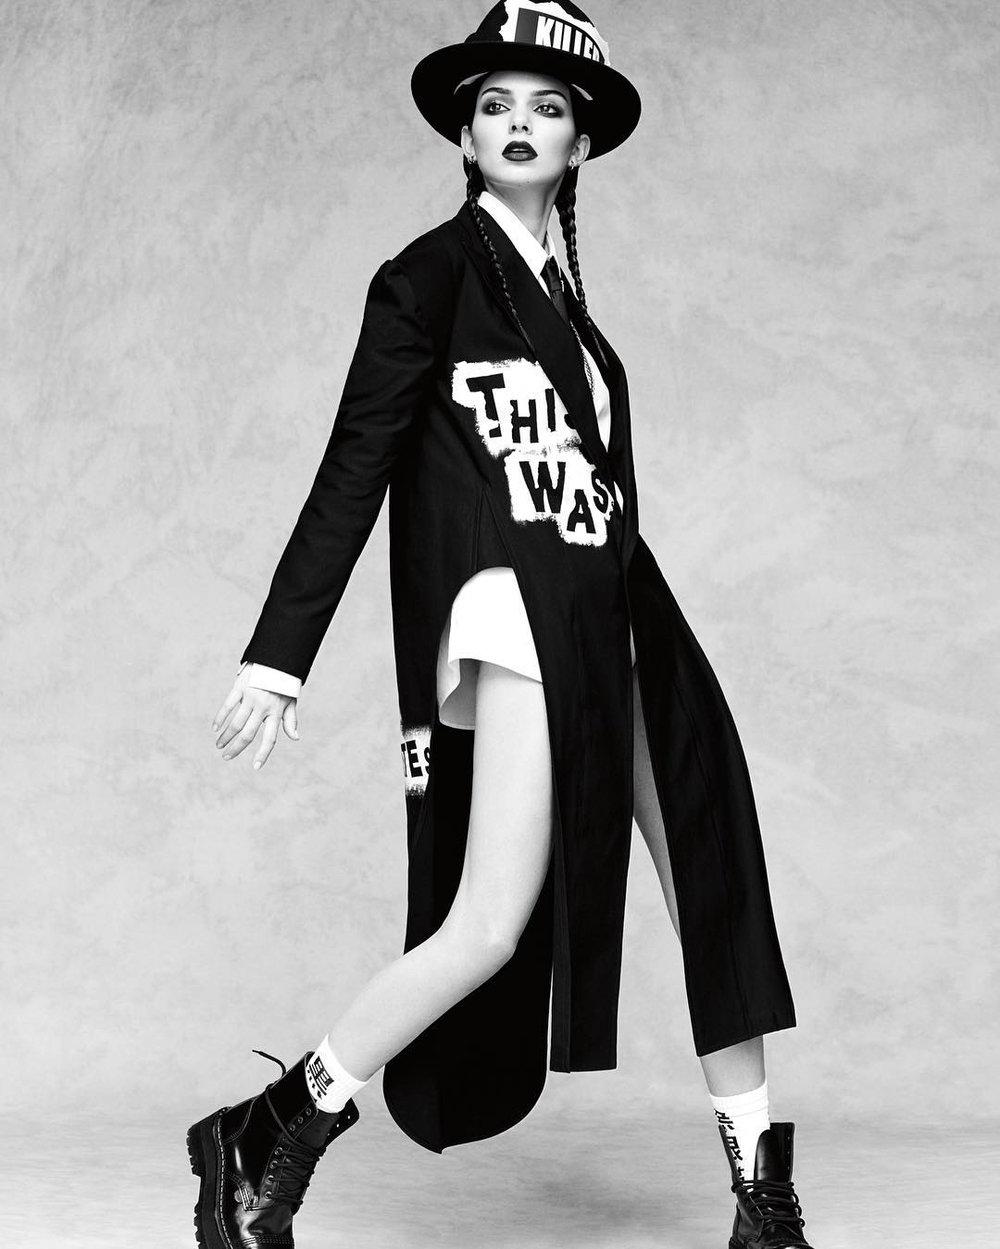 Vogue_Japan-October_2016-Kendall_Jenner-by-Luigi_and_Iango-p01.jpg